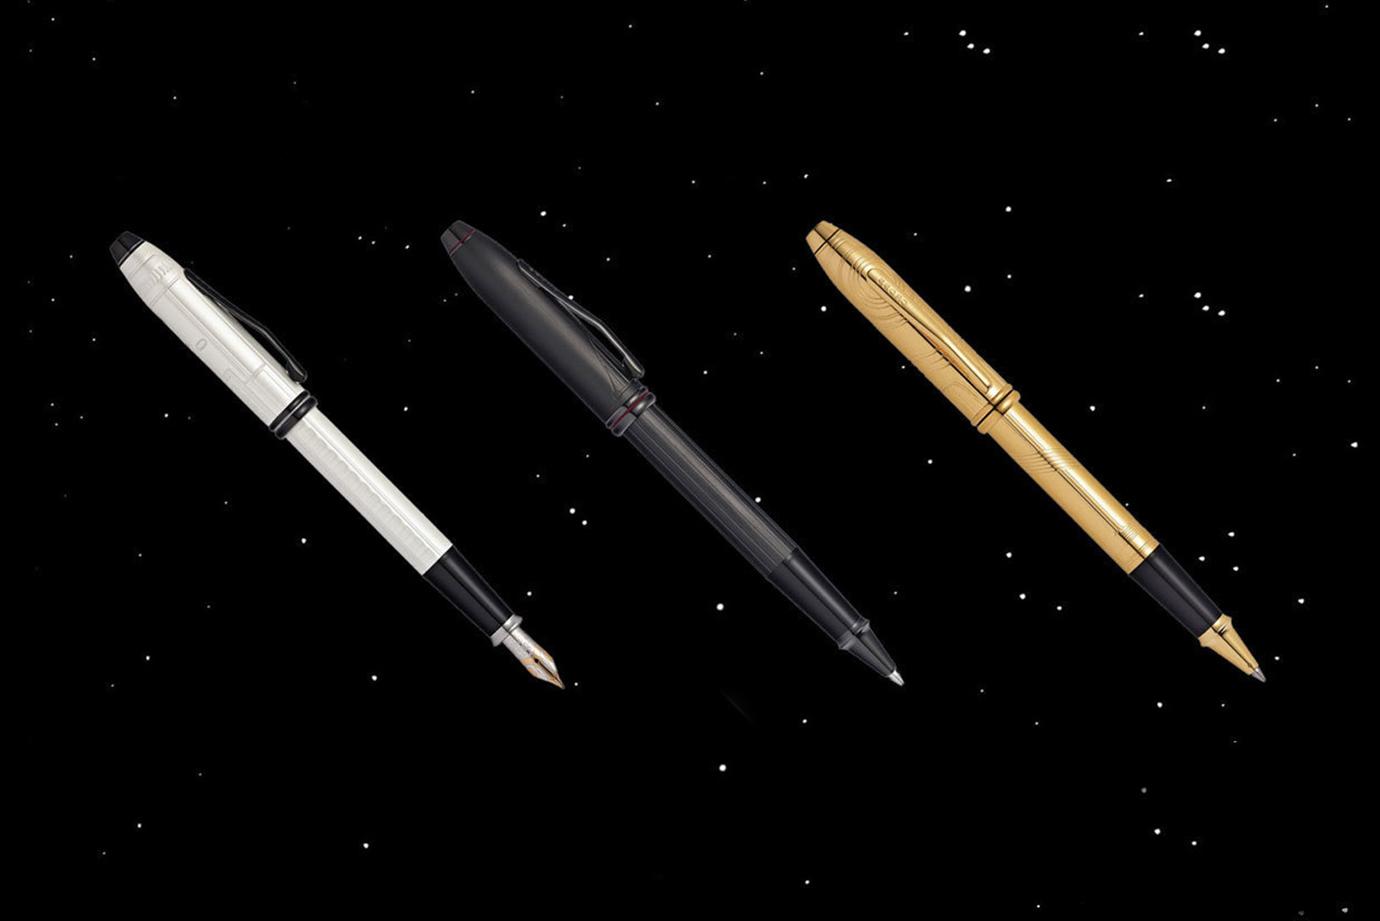 Star Wars x Bezar x Cross Limited Edition Townsend Pens